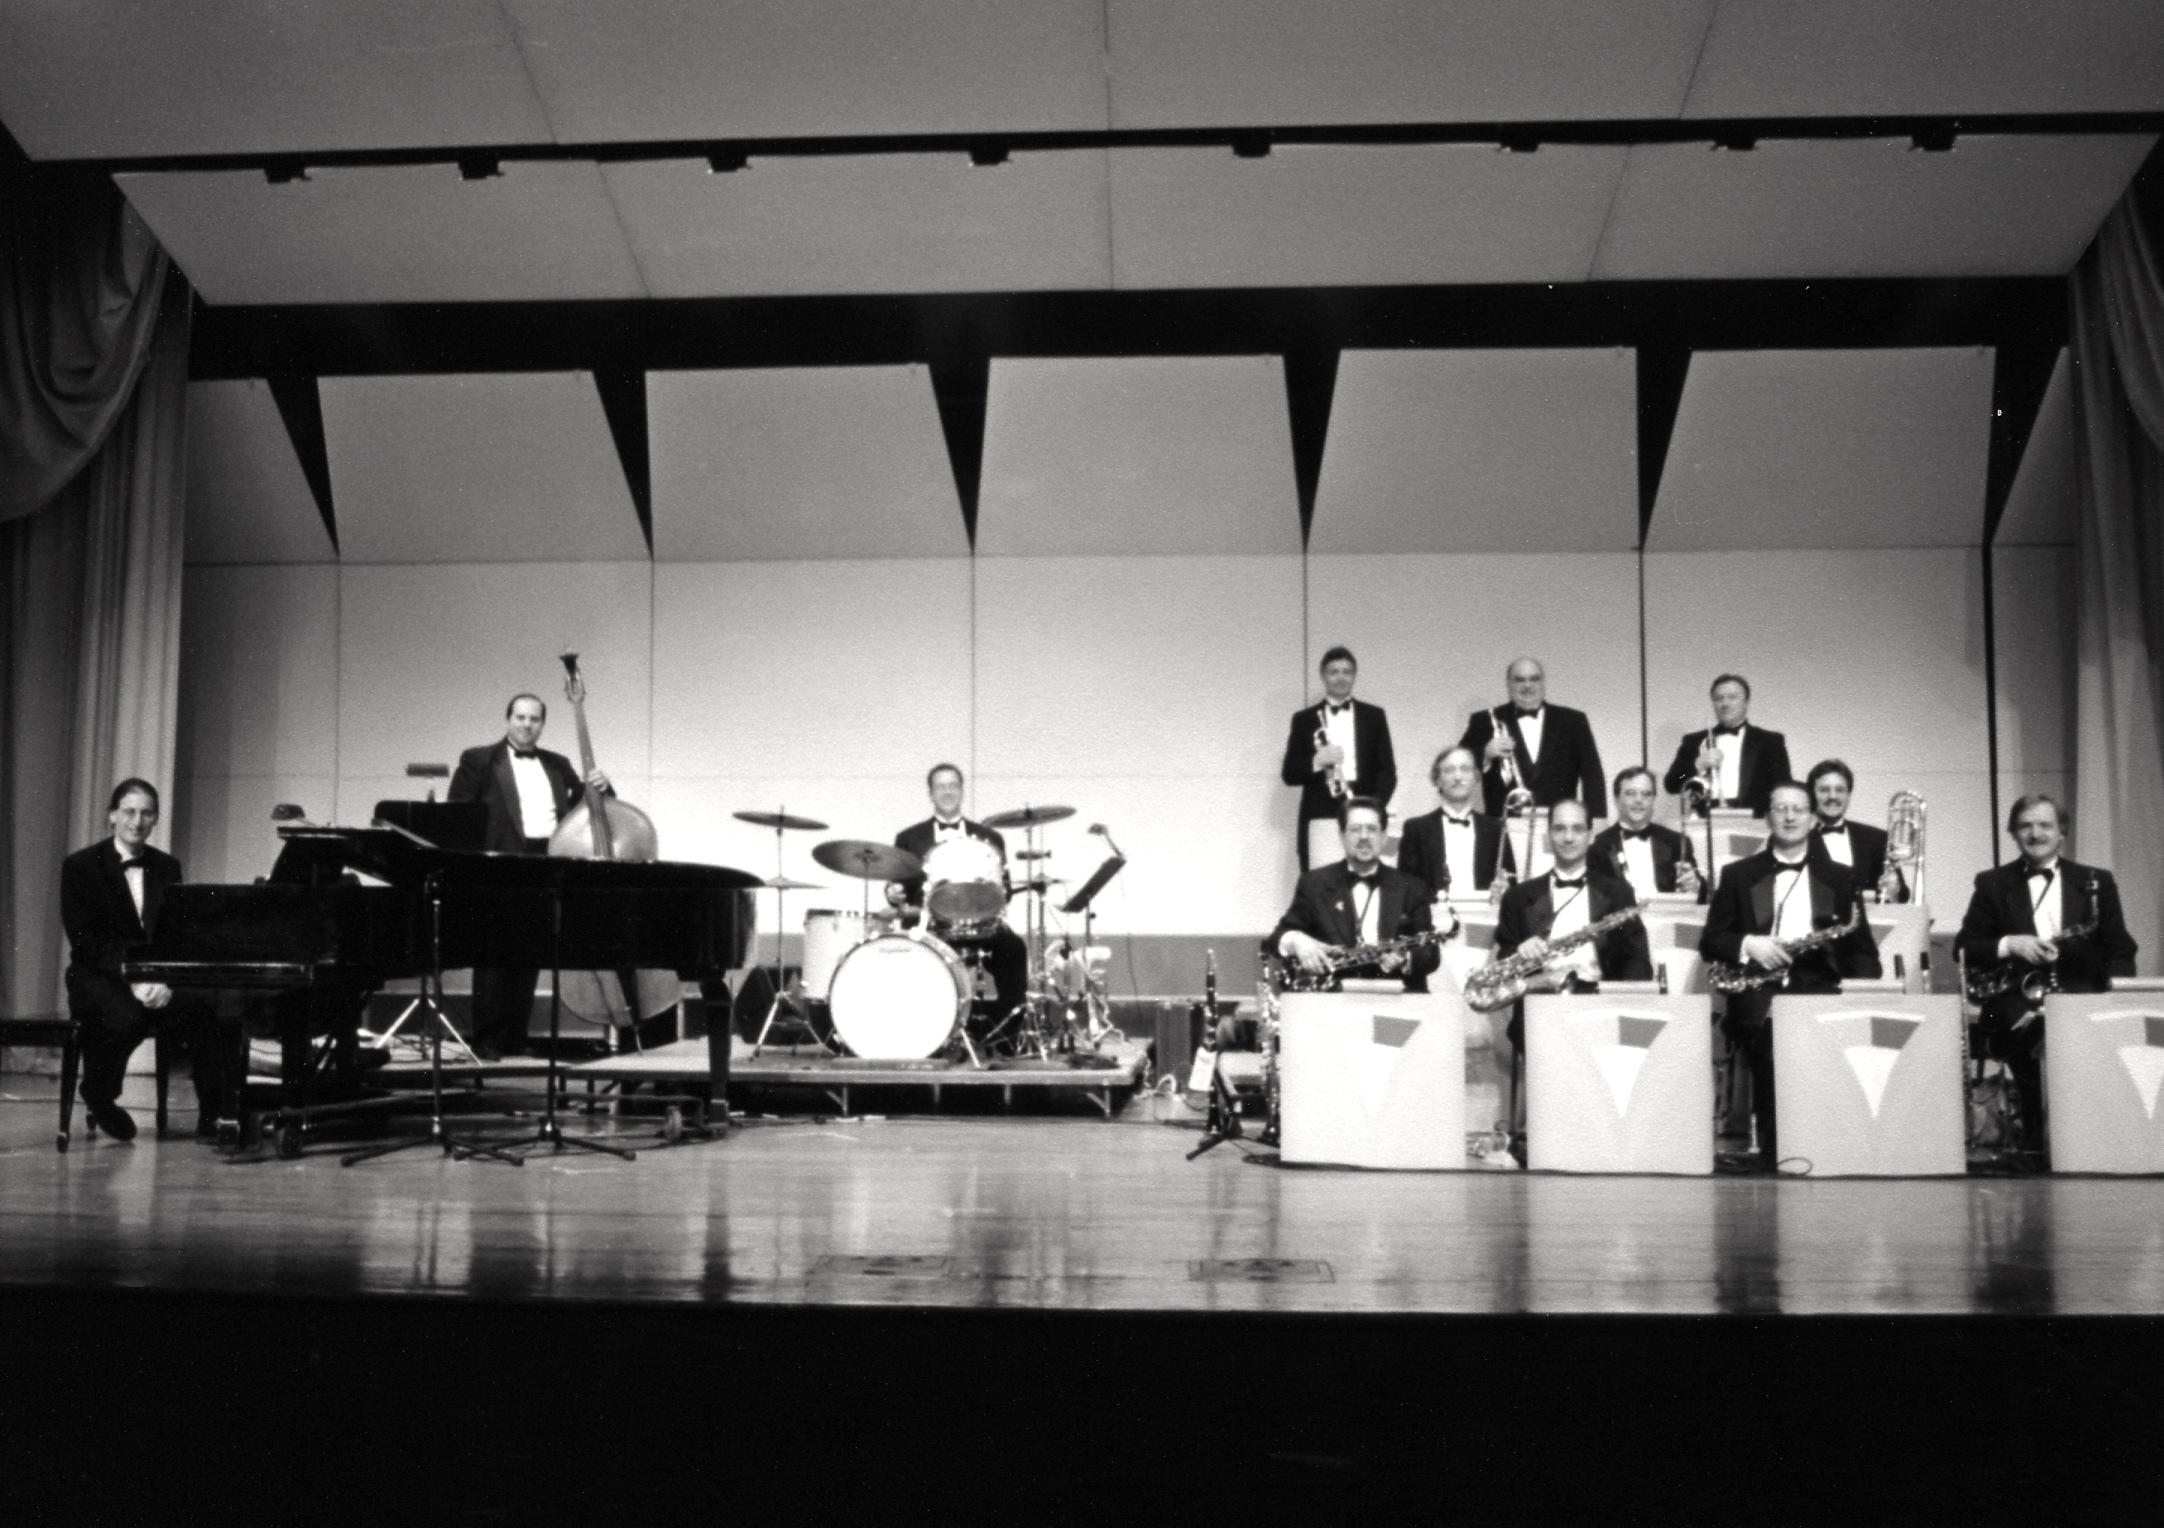 Duke Ellington Centennial Concert